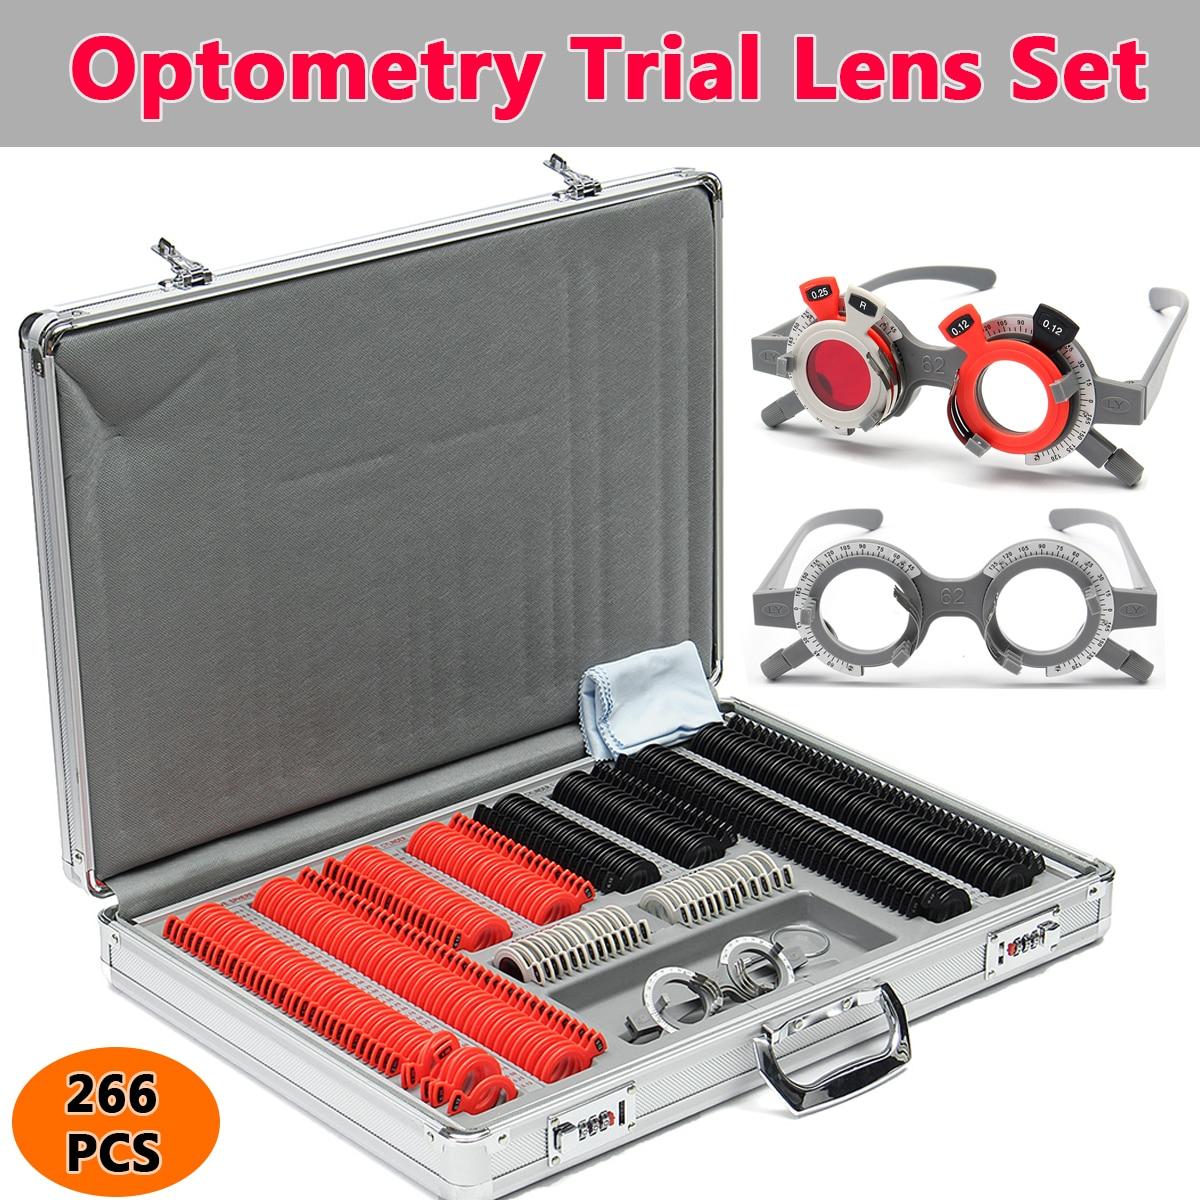 266 Pcs Trial Lens Set Optical Lens Optometry Rim Case Evidence Box Aluminum Rim Kit Optometry Test Trial Frame266 Pcs Trial Lens Set Optical Lens Optometry Rim Case Evidence Box Aluminum Rim Kit Optometry Test Trial Frame